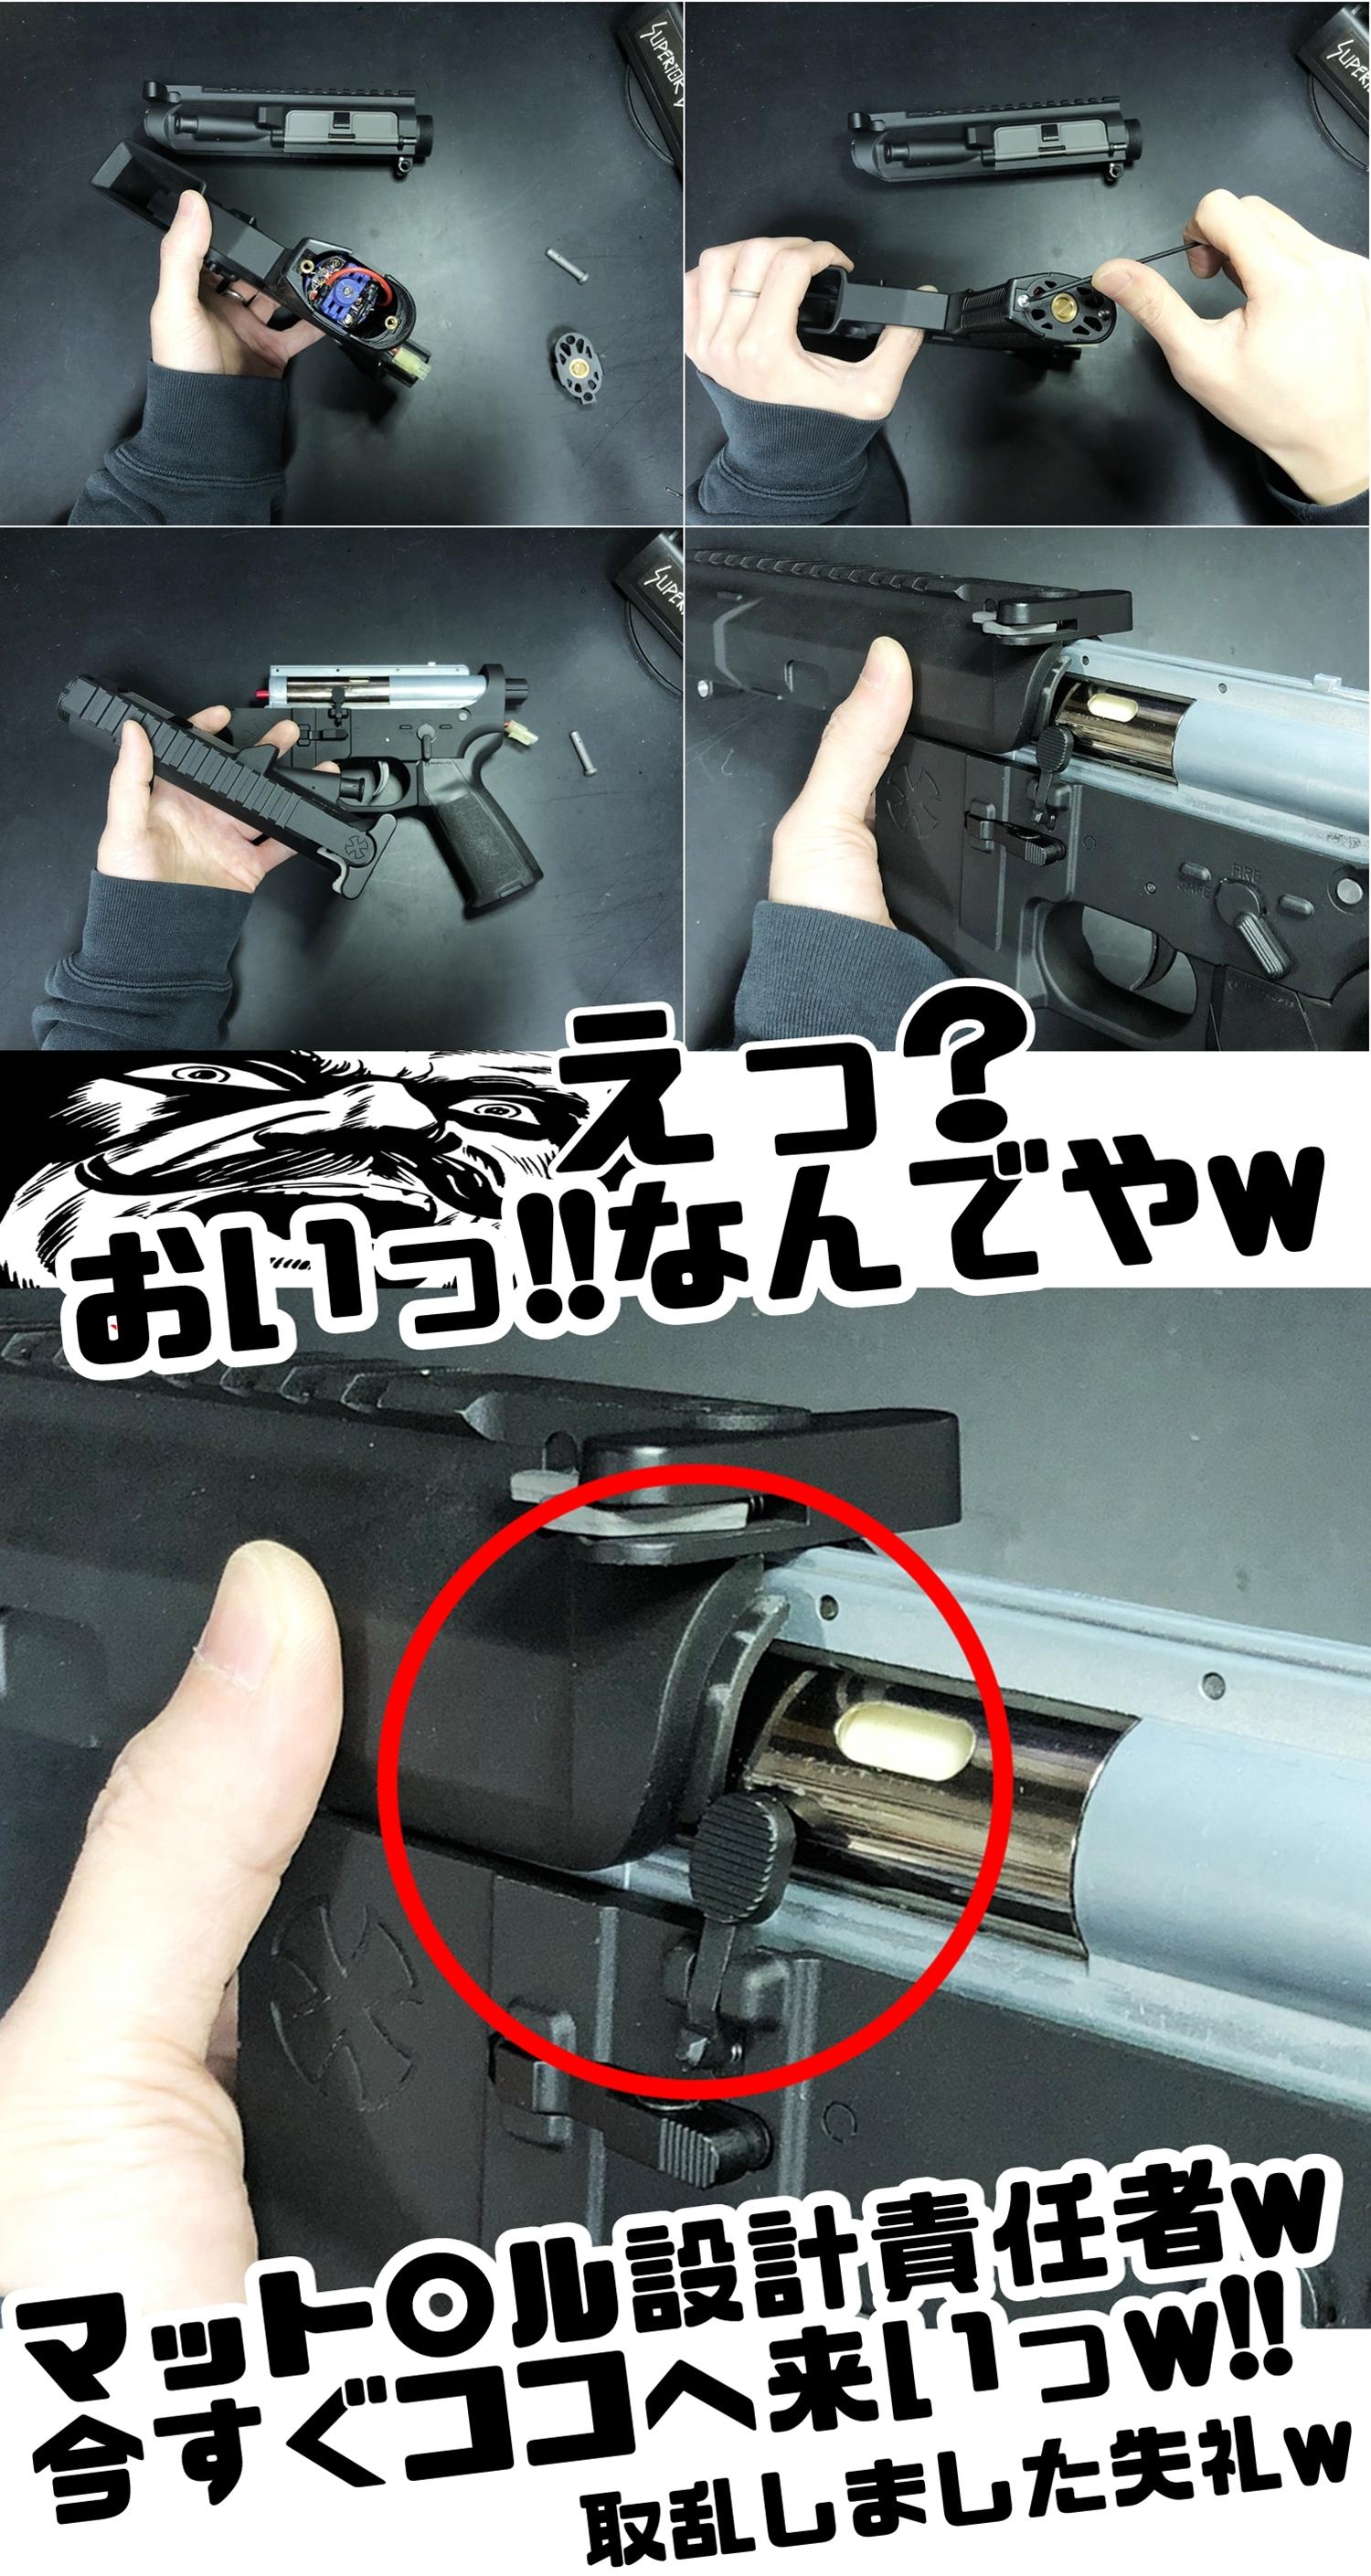 15 NOVESKE GEN3 N4 BY MADBULL!! 『第一弾』 新たにSTD民間系ARを作り始めたいと思います!! STD AR-15 M4 スタンダード 電動ガン マルイ ノベスケ ノベスキー マットブル メタルフレーム 動作テスト 組込 取付 カス